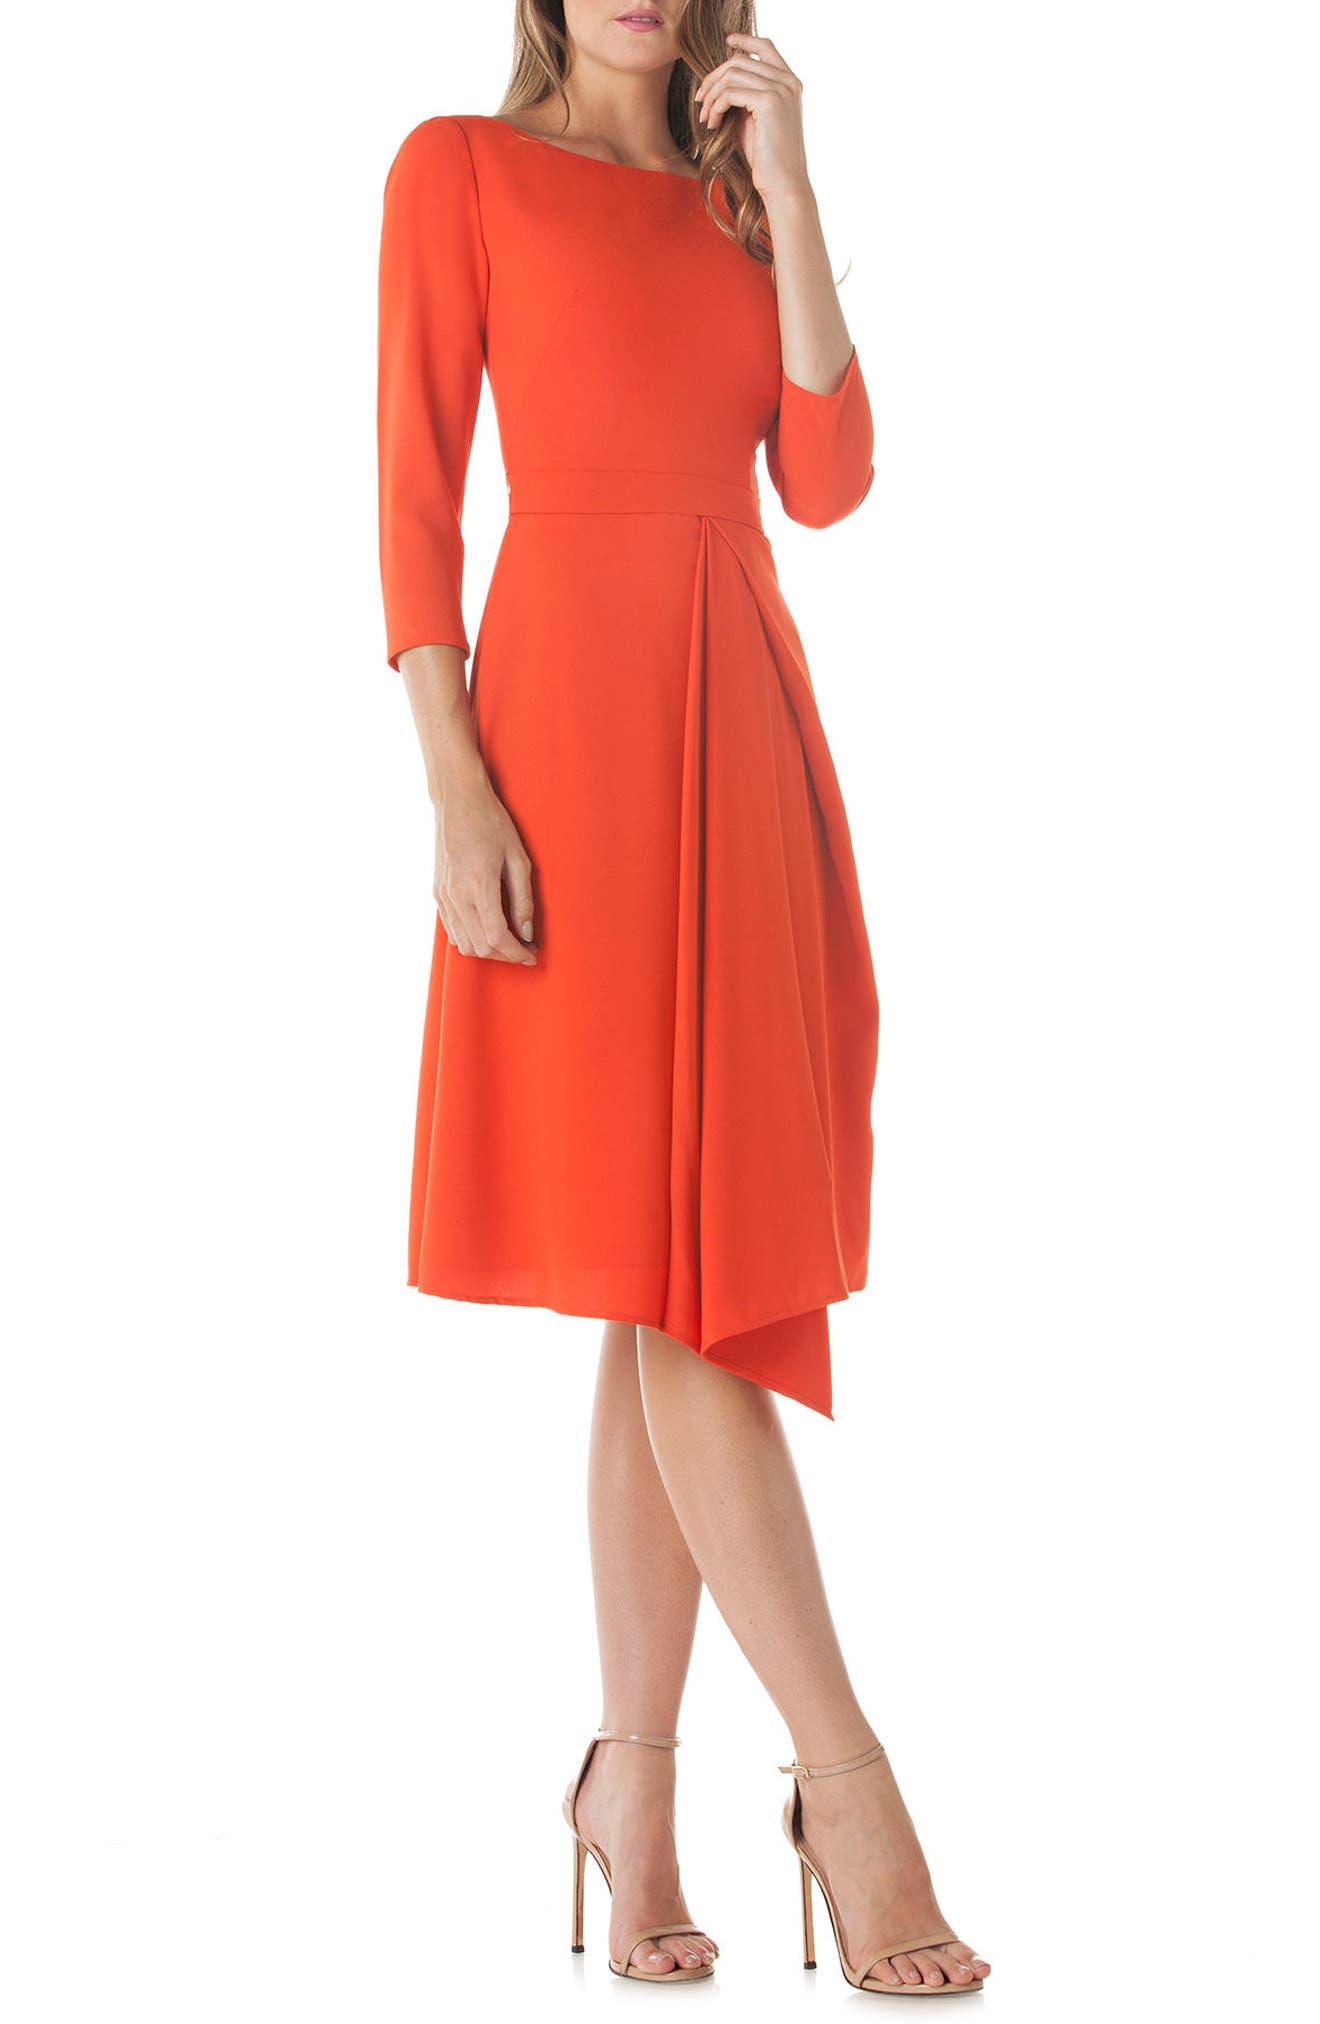 KAY UNGER Asymmetrical Pleat V-Back Dress, Main, color, 950